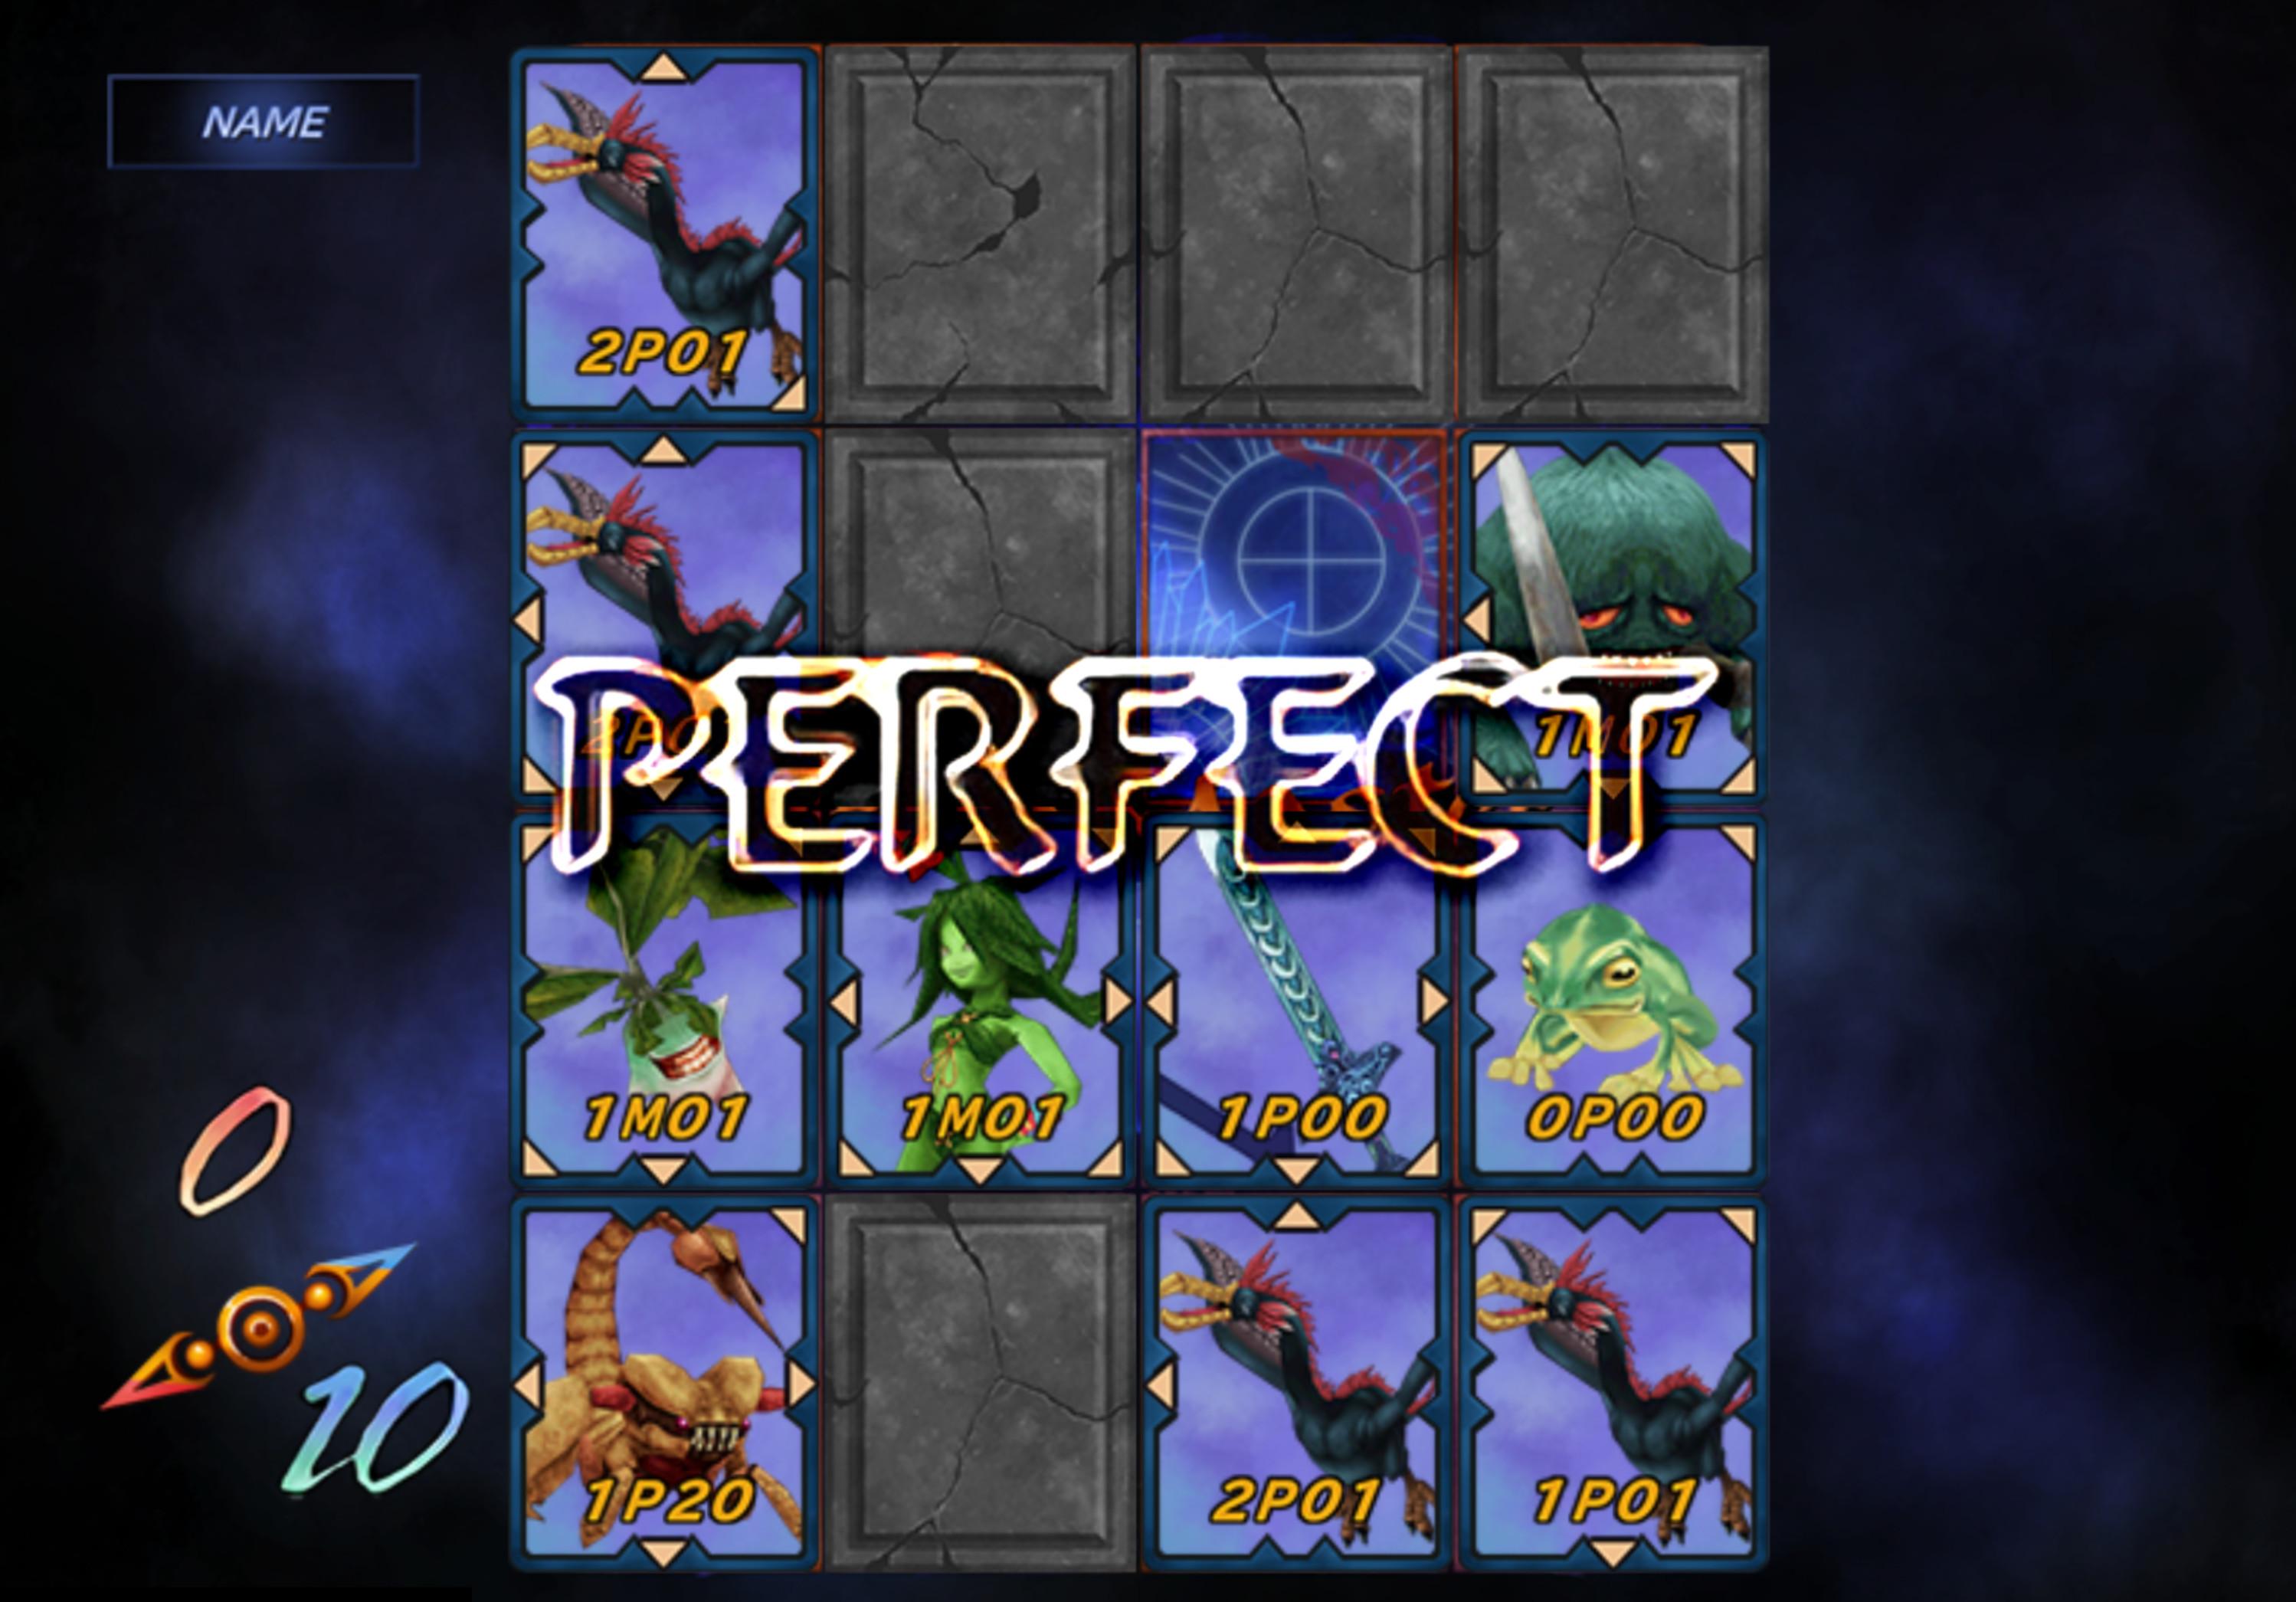 File:FF9CardPerfect.jpg